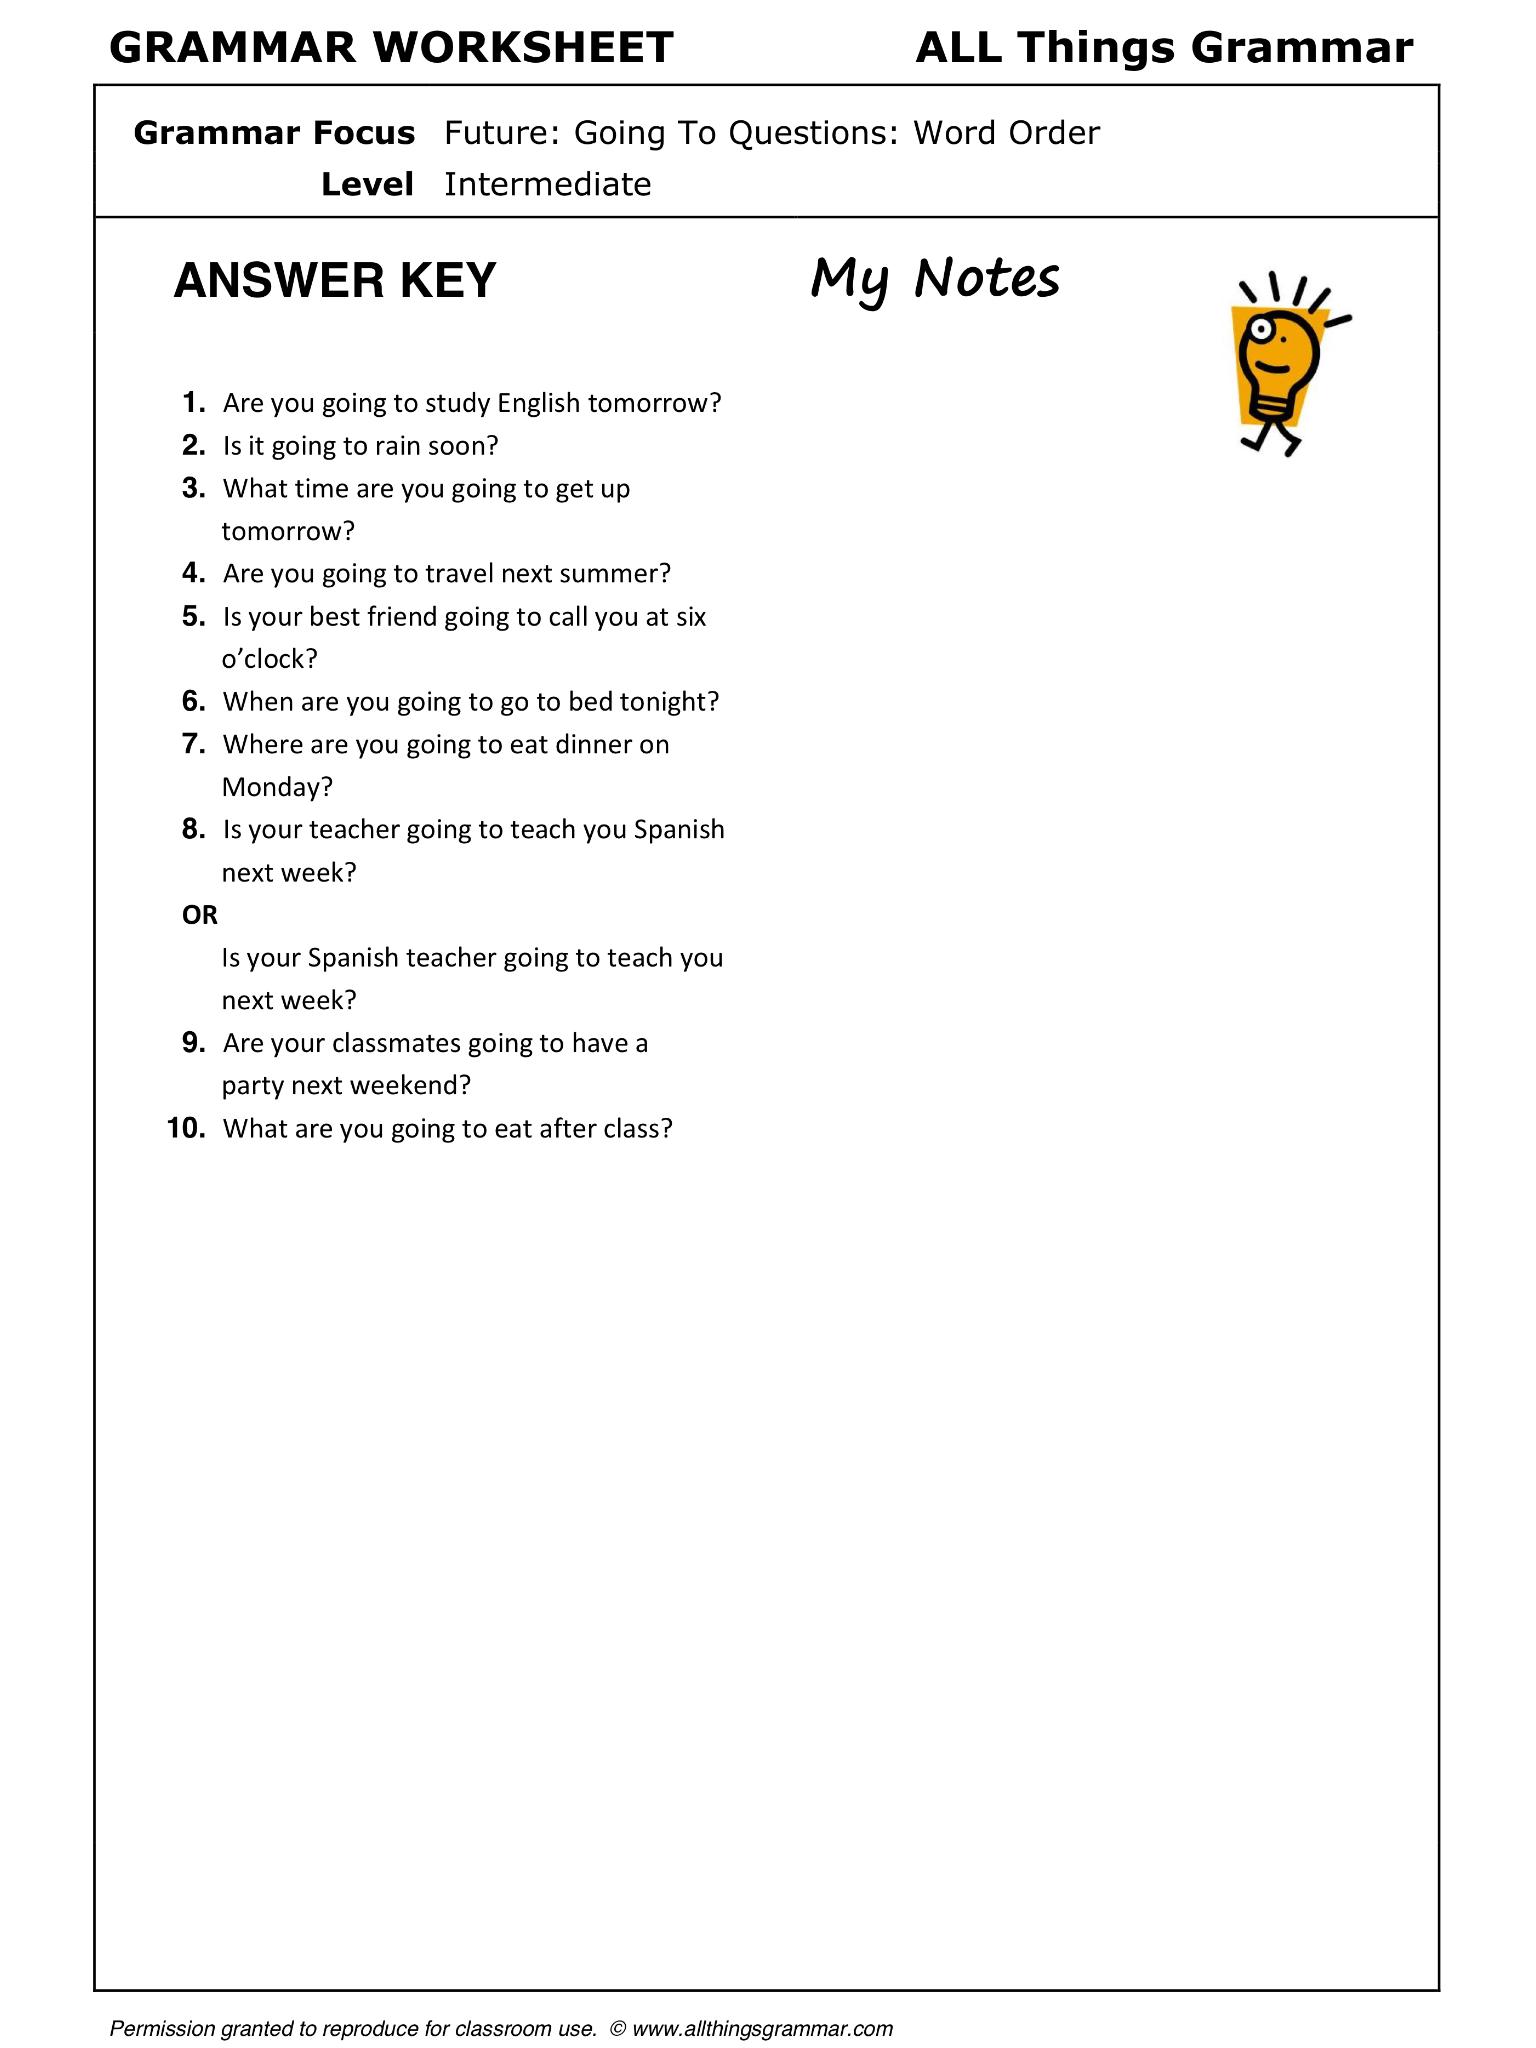 worksheet Word Order Worksheets english grammar going to questions word order www allthingsgrammar com word